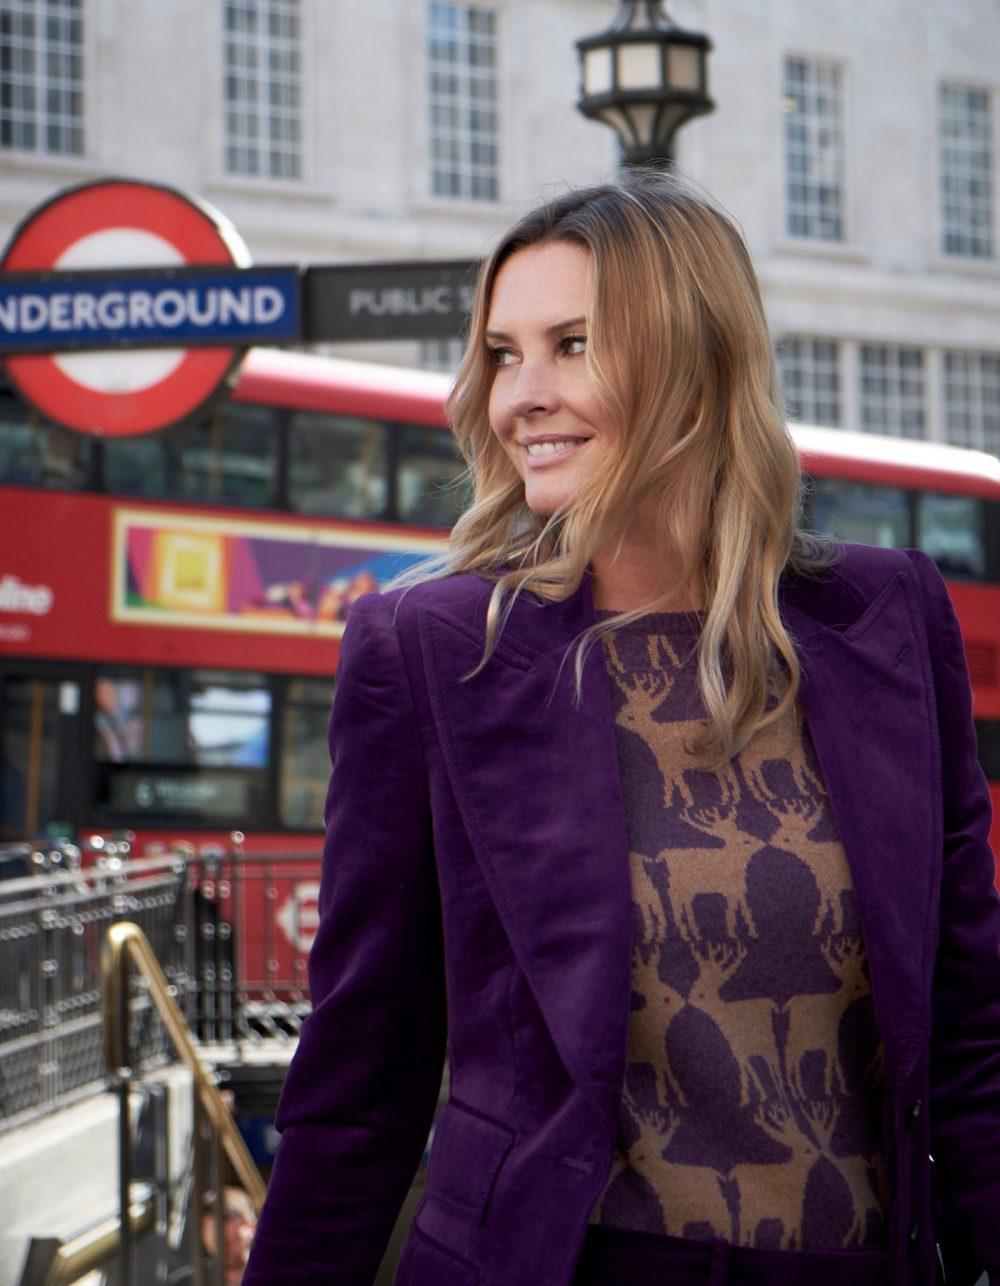 Model outside a London underground station wearing cashmere knitwear, the malin darlin Reindeer purple cashmere jumper.